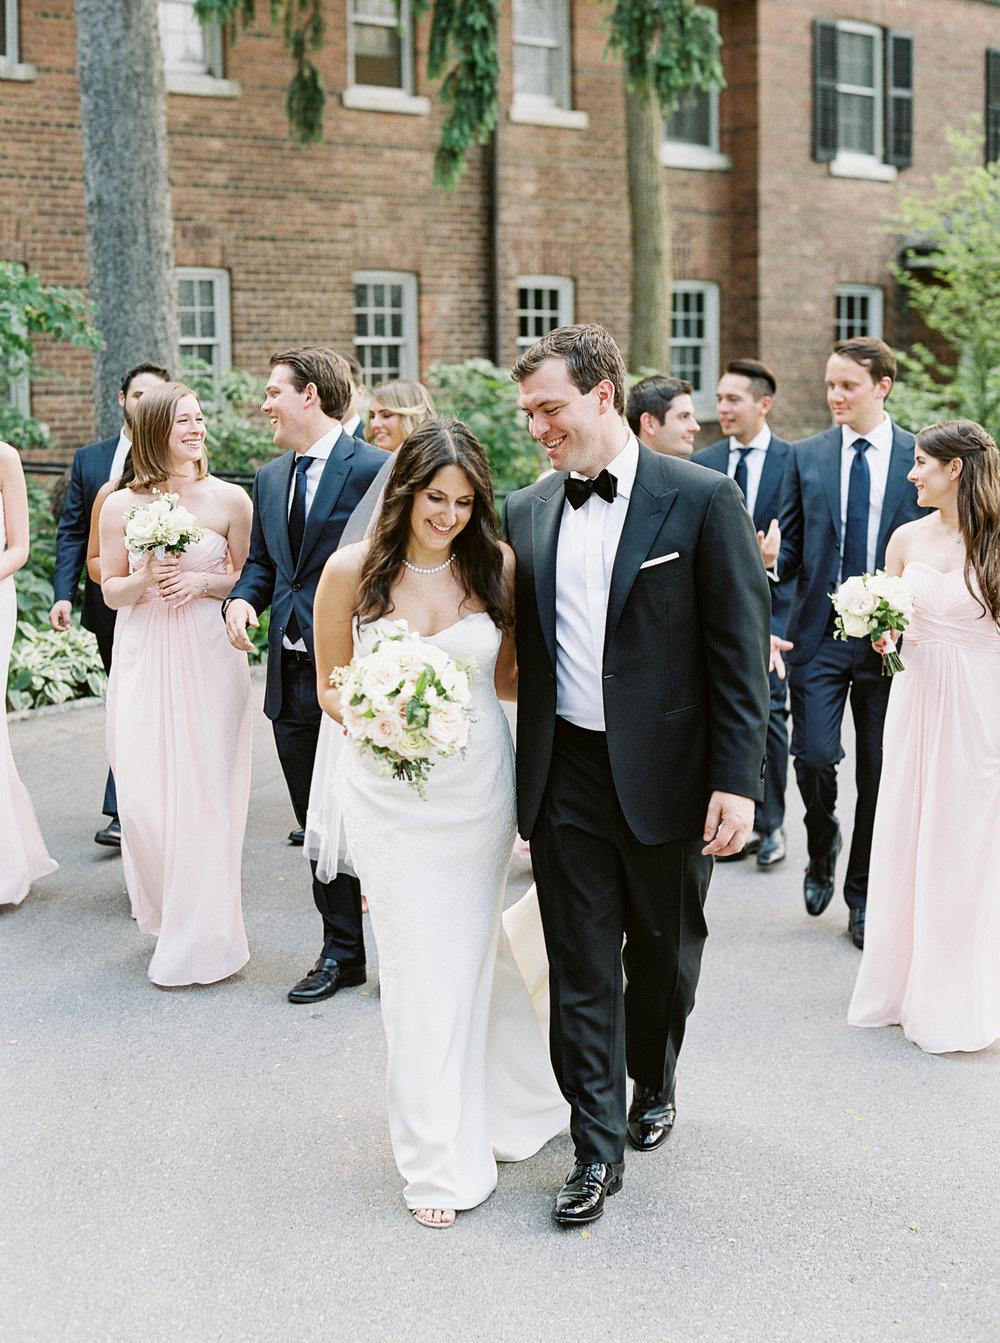 0667-Nadia-Chris-Married-When He Founf Her-Toronto Golf Club.jpg